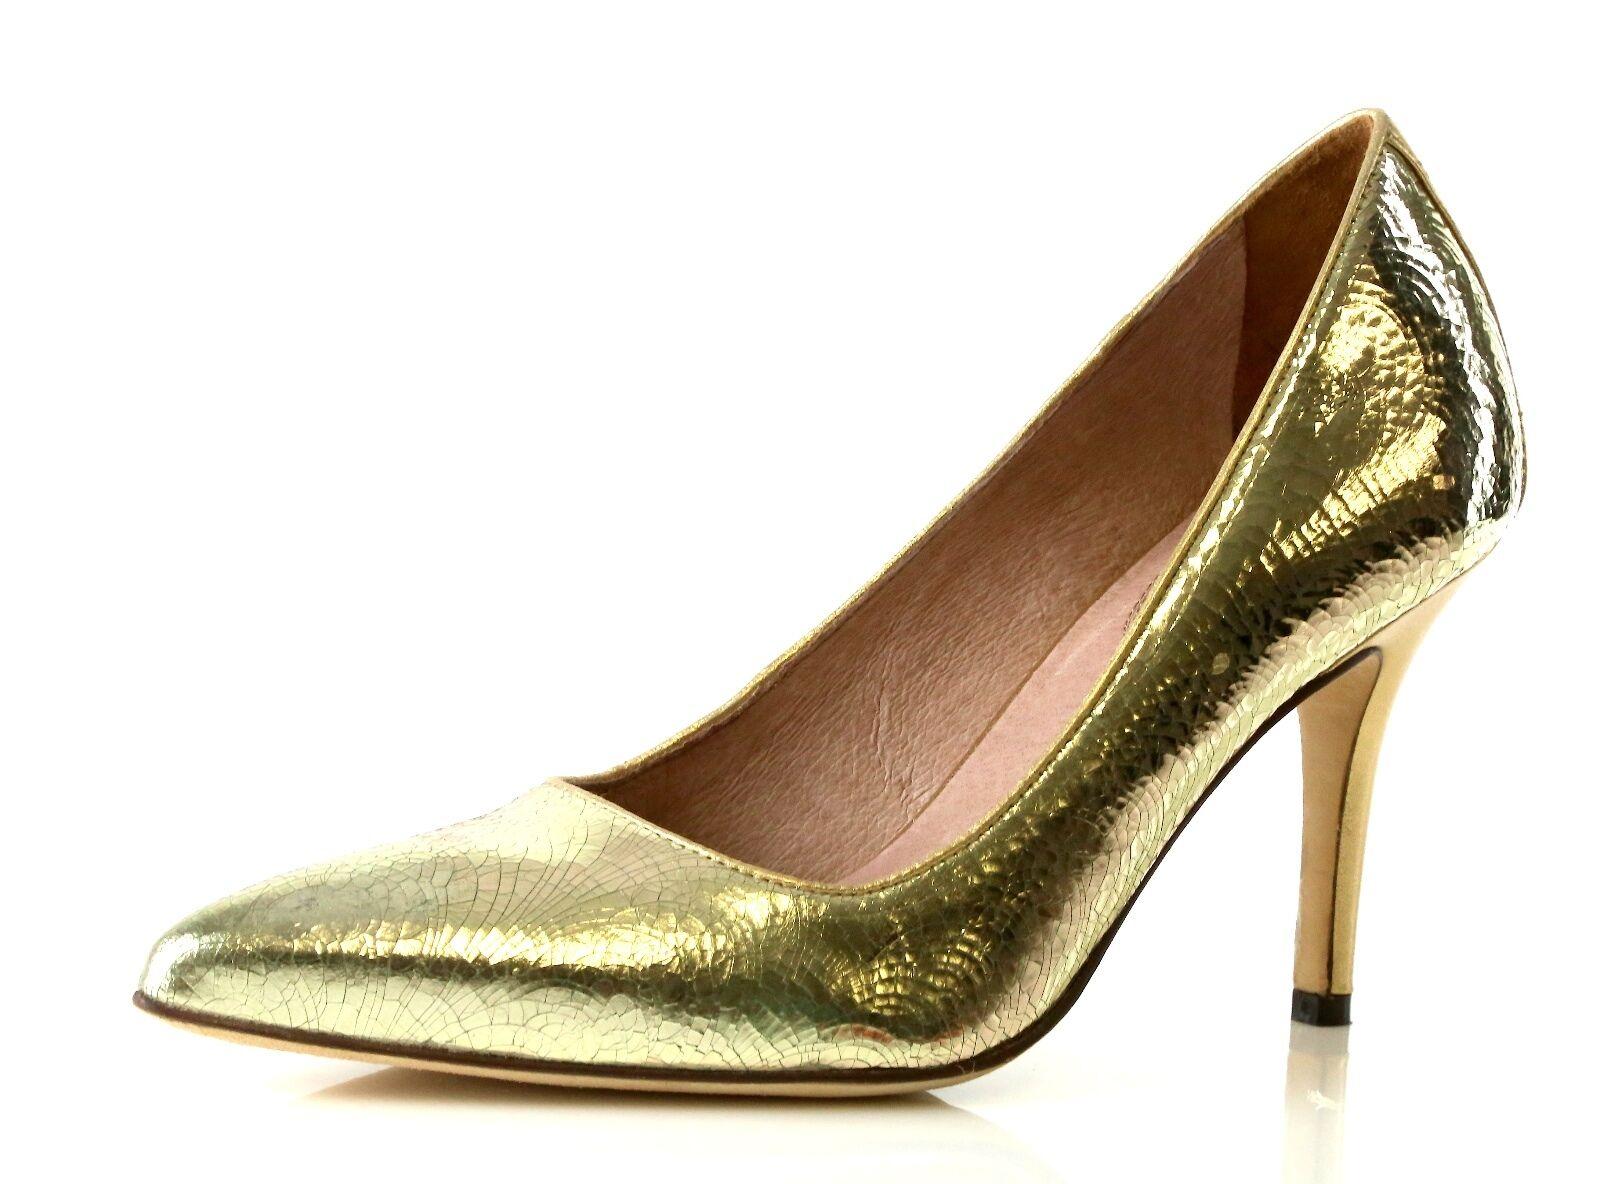 Corso Como Clemson gold Metallic Distressed Pumps 8875 Size 8 M NEW